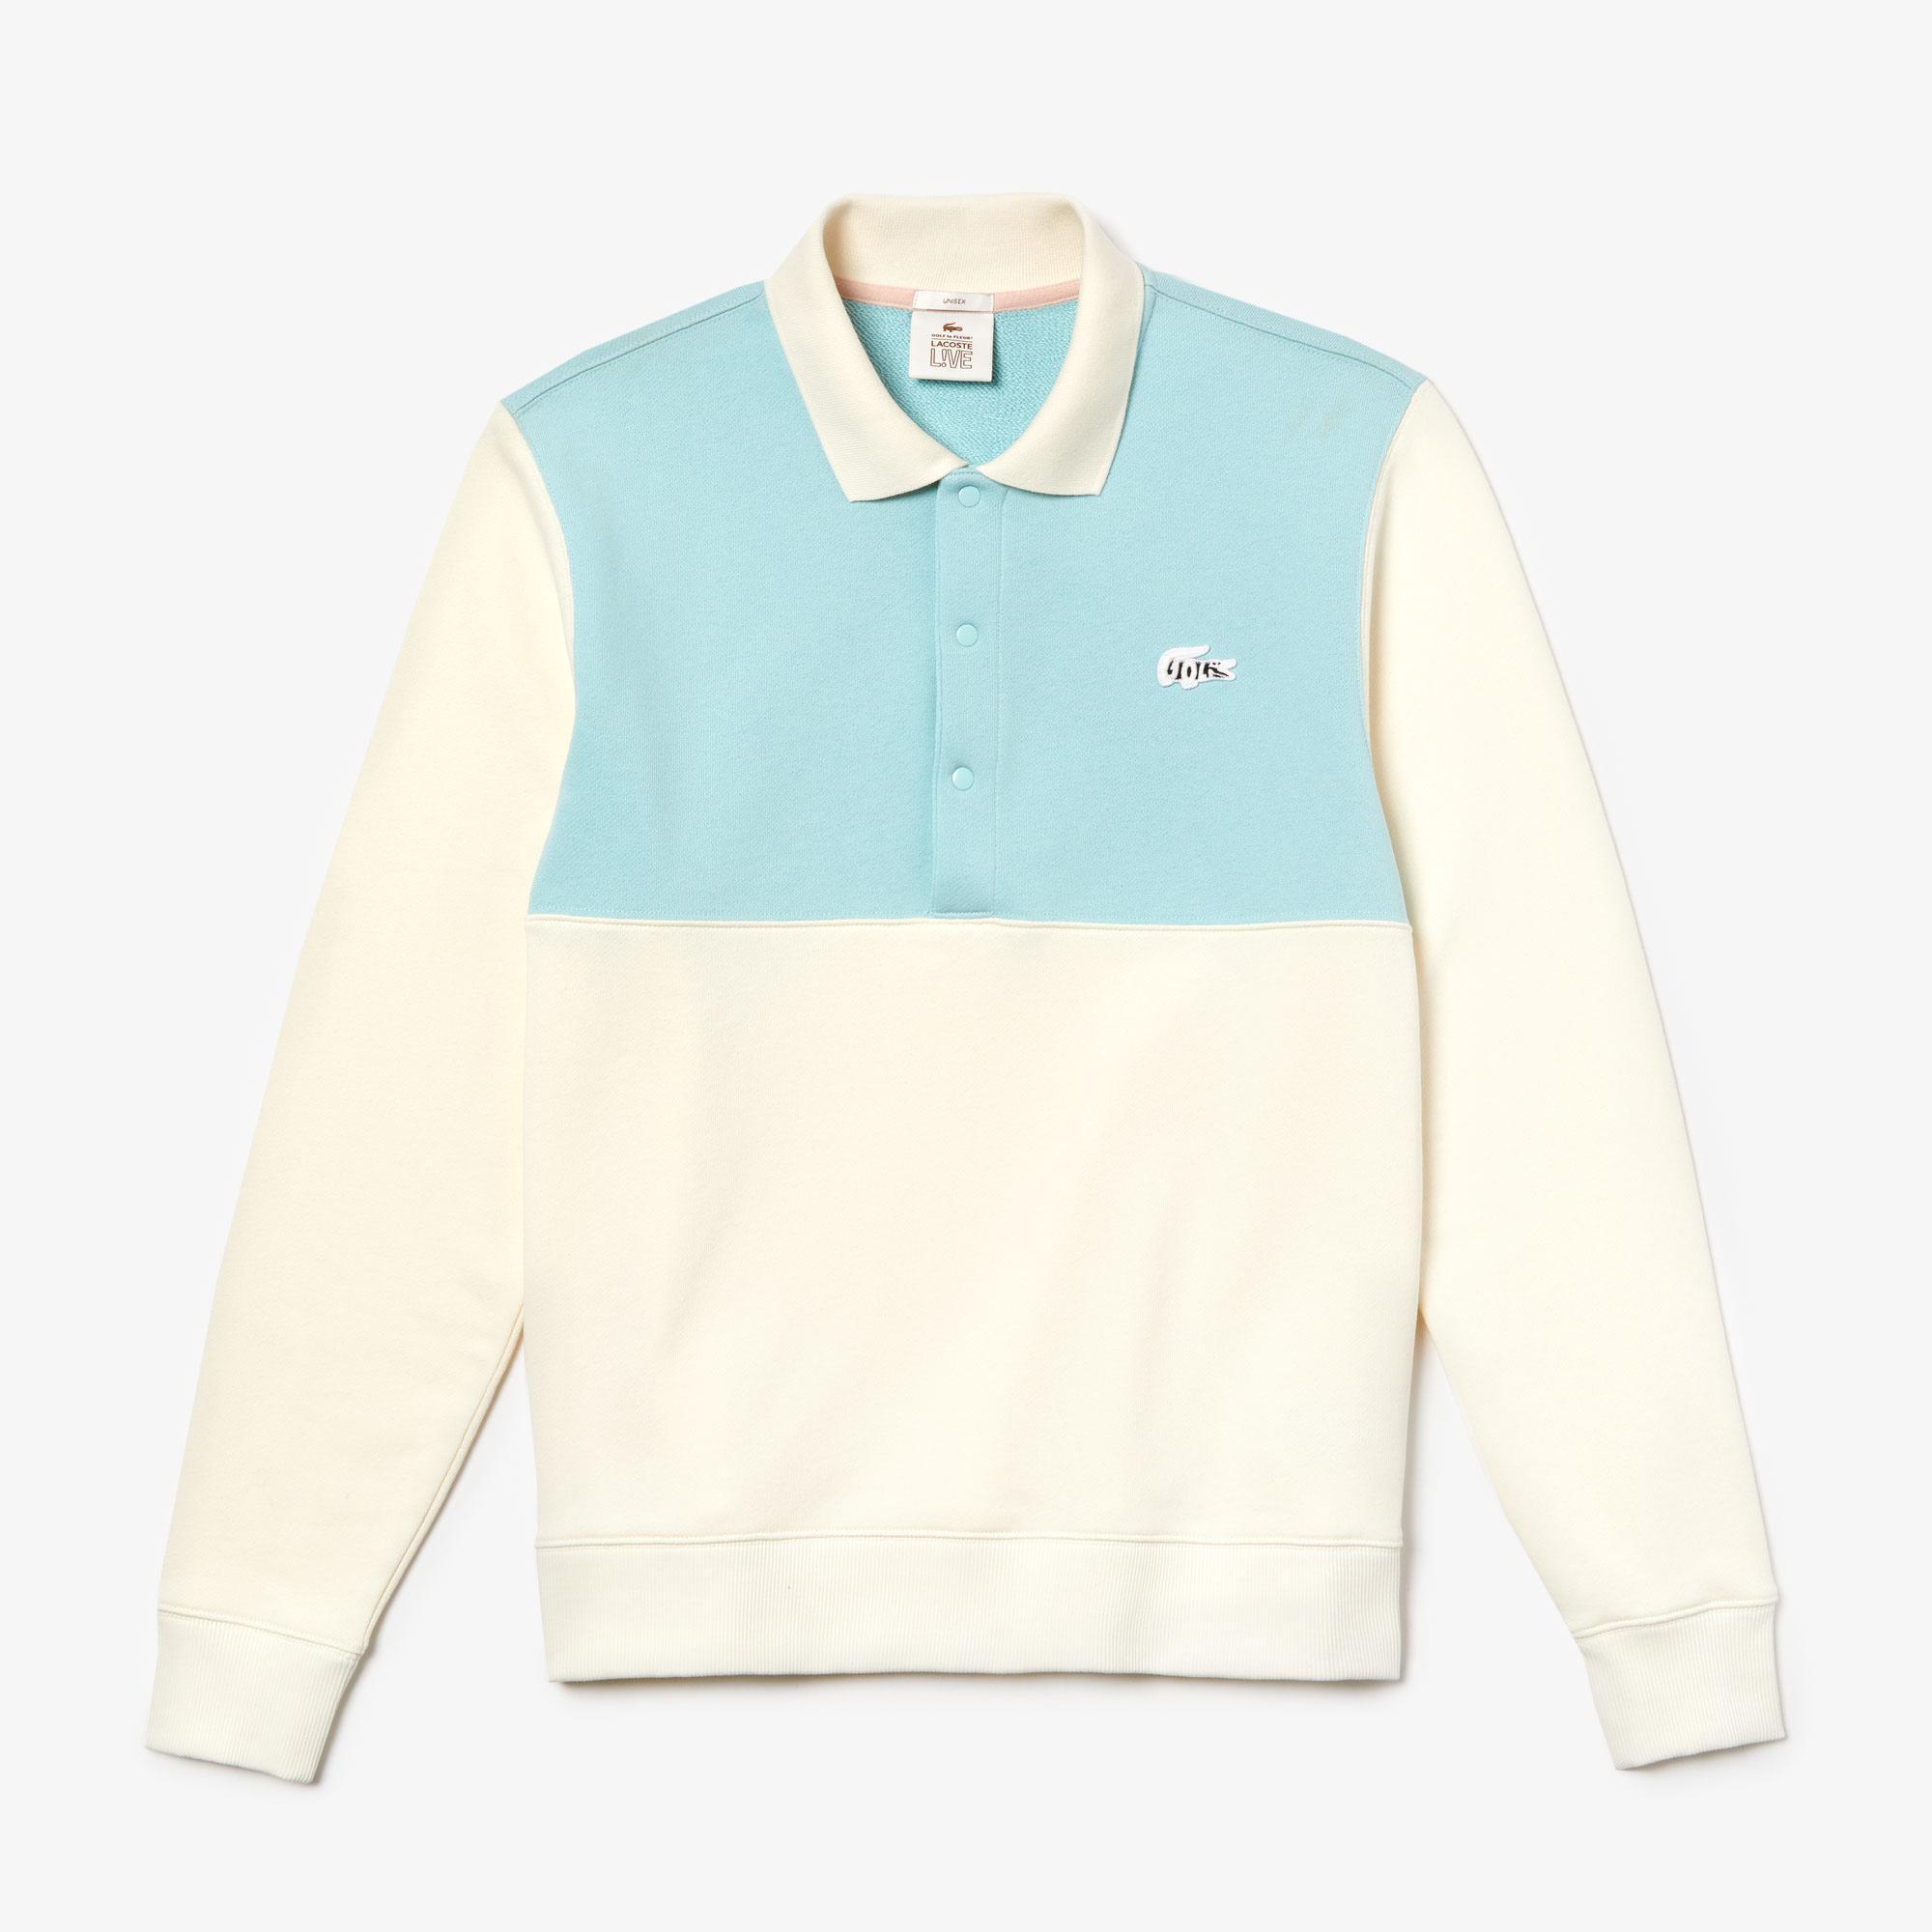 Lacoste X GOLF le FLEUR Unisex Loose Fit Blok Desenli Polo Yaka Bej - Mavi Sweatshirt